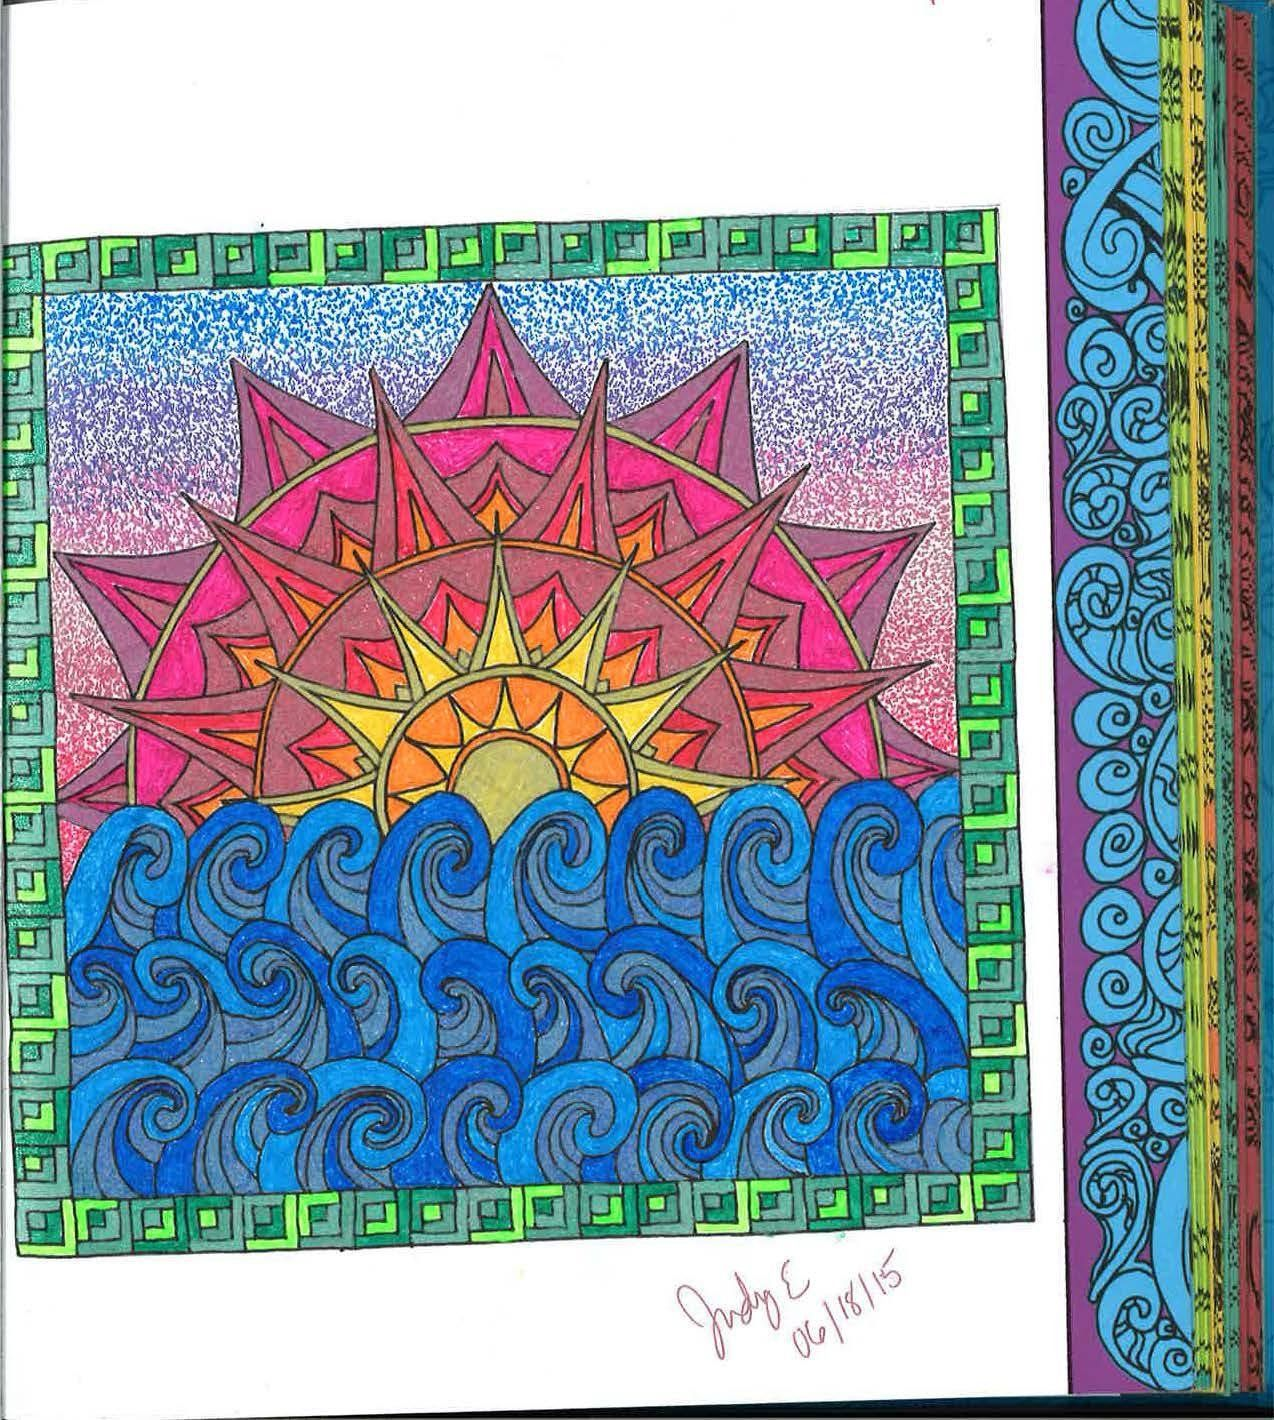 Zen ocean colouring book - Color Me Calm 100 Coloring Templates For Meditation And Relaxation A Zen Coloring Book